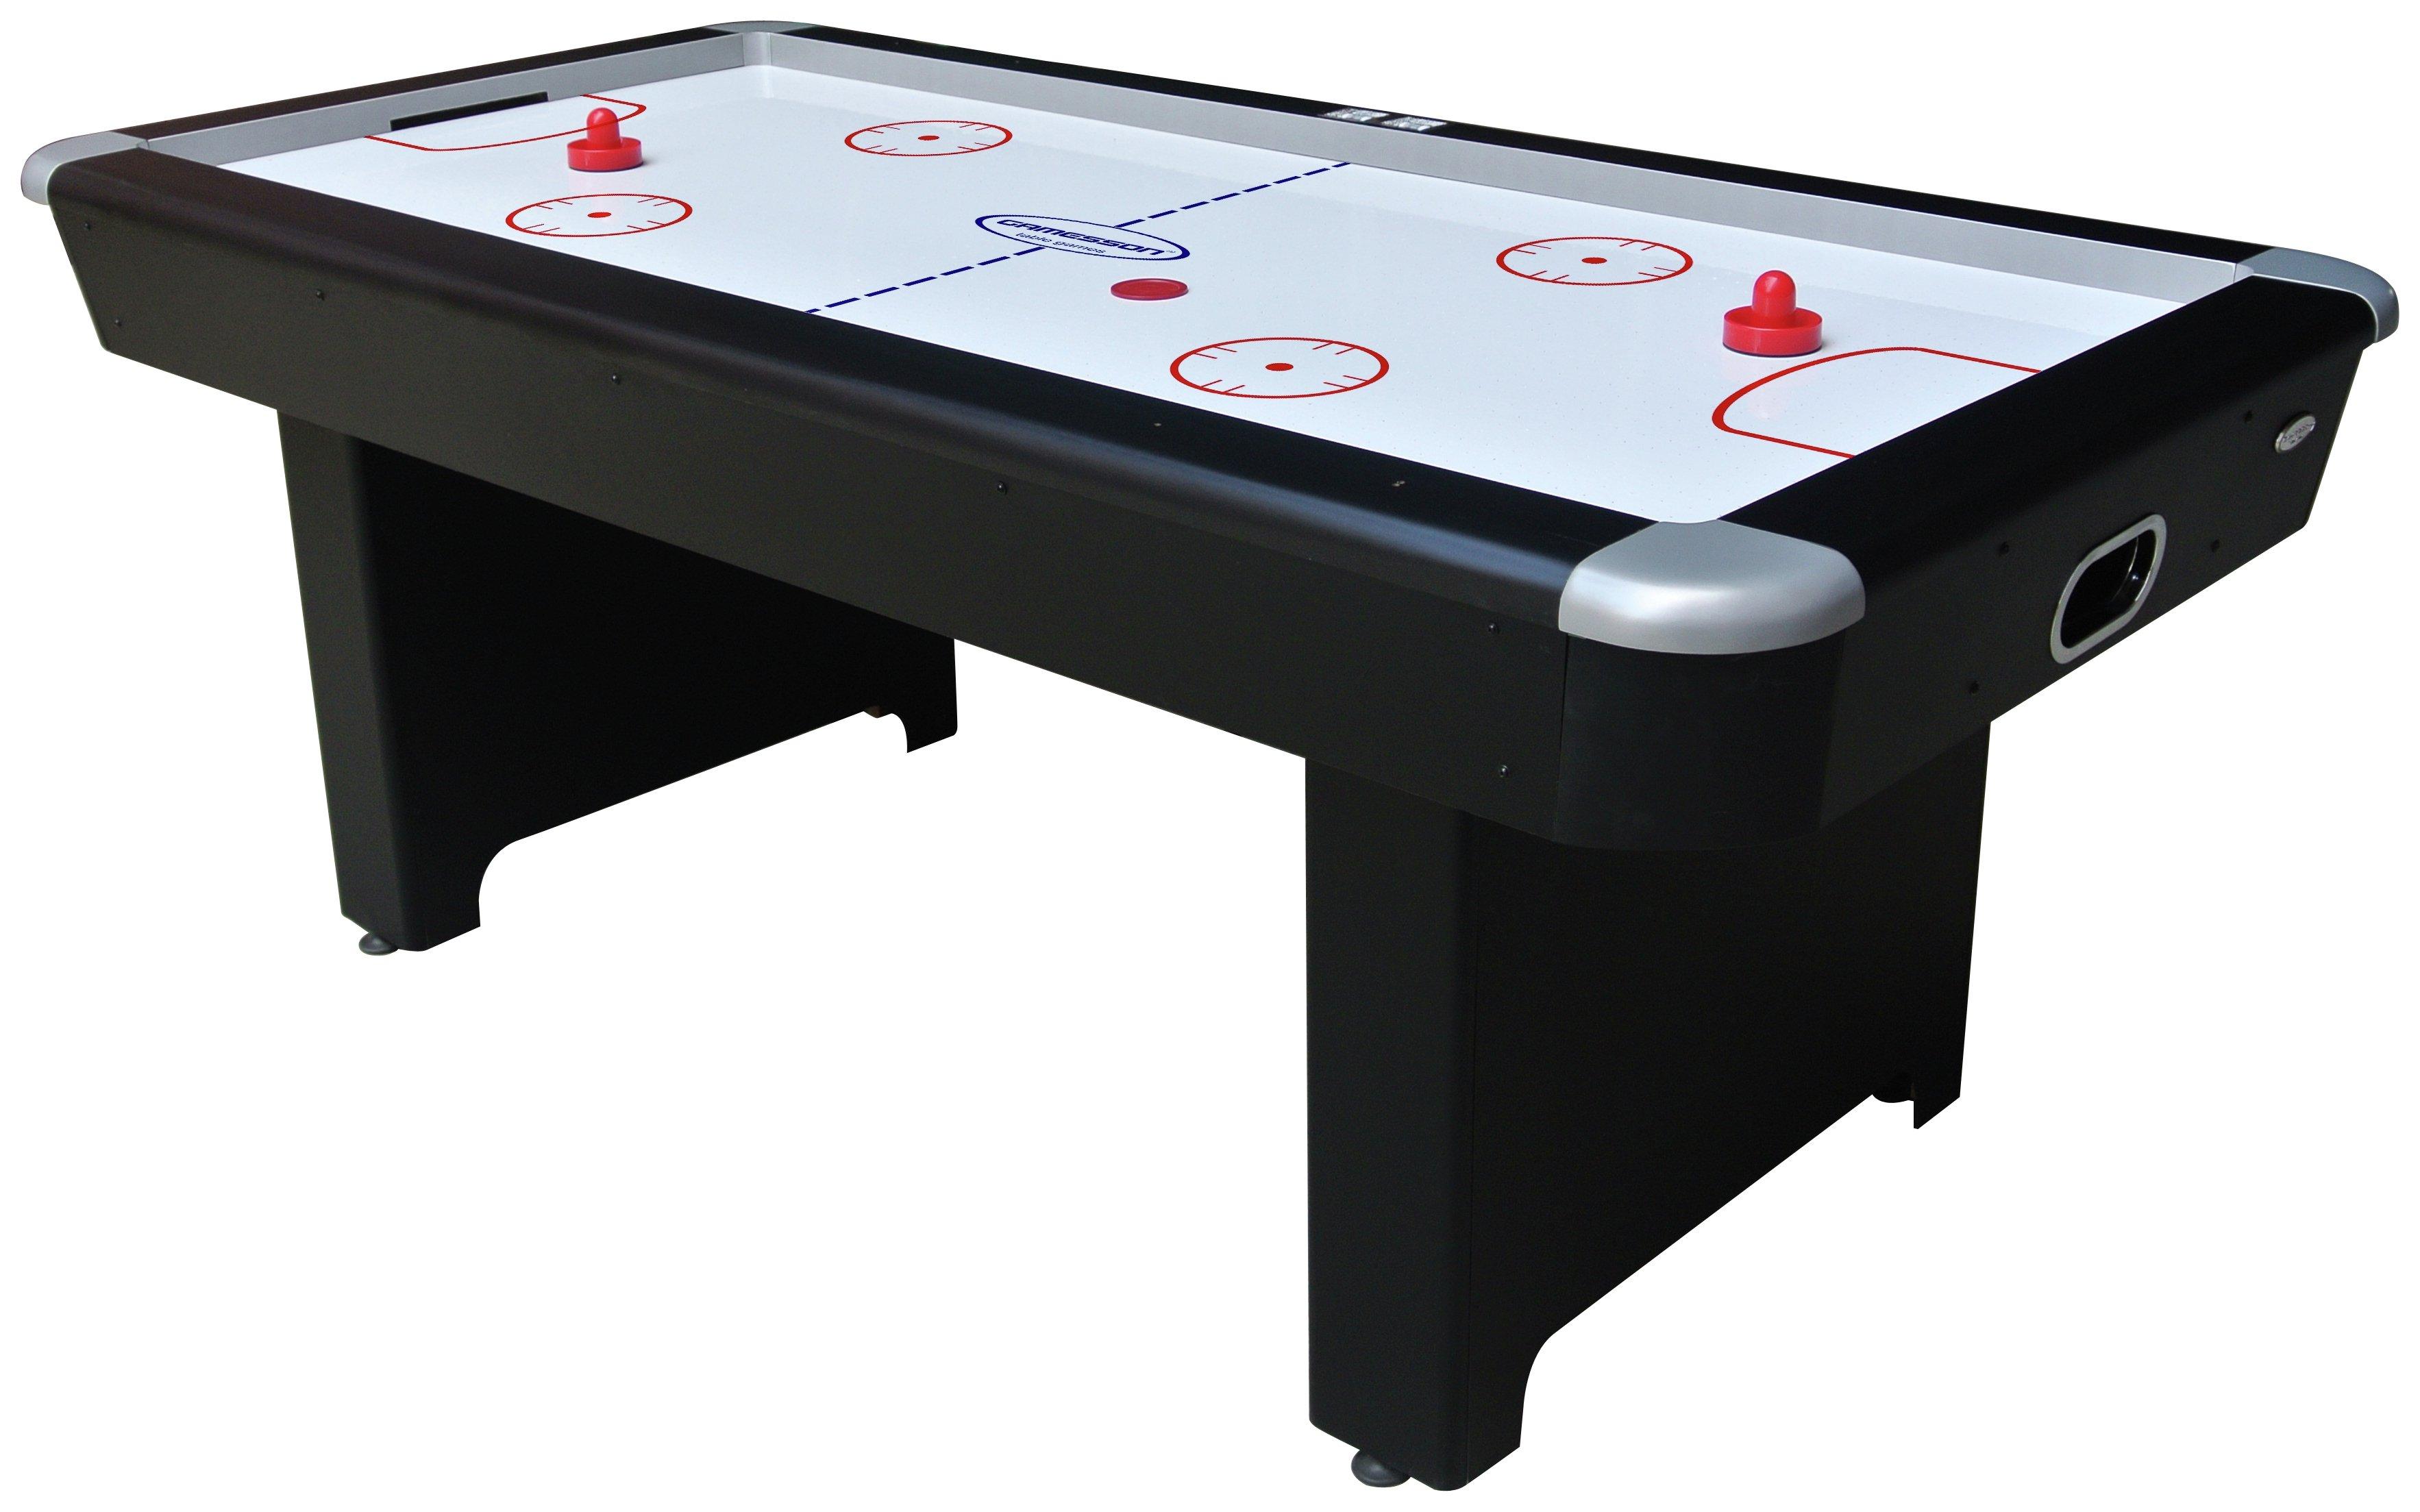 gamesson-coliseum-air-hockey-table